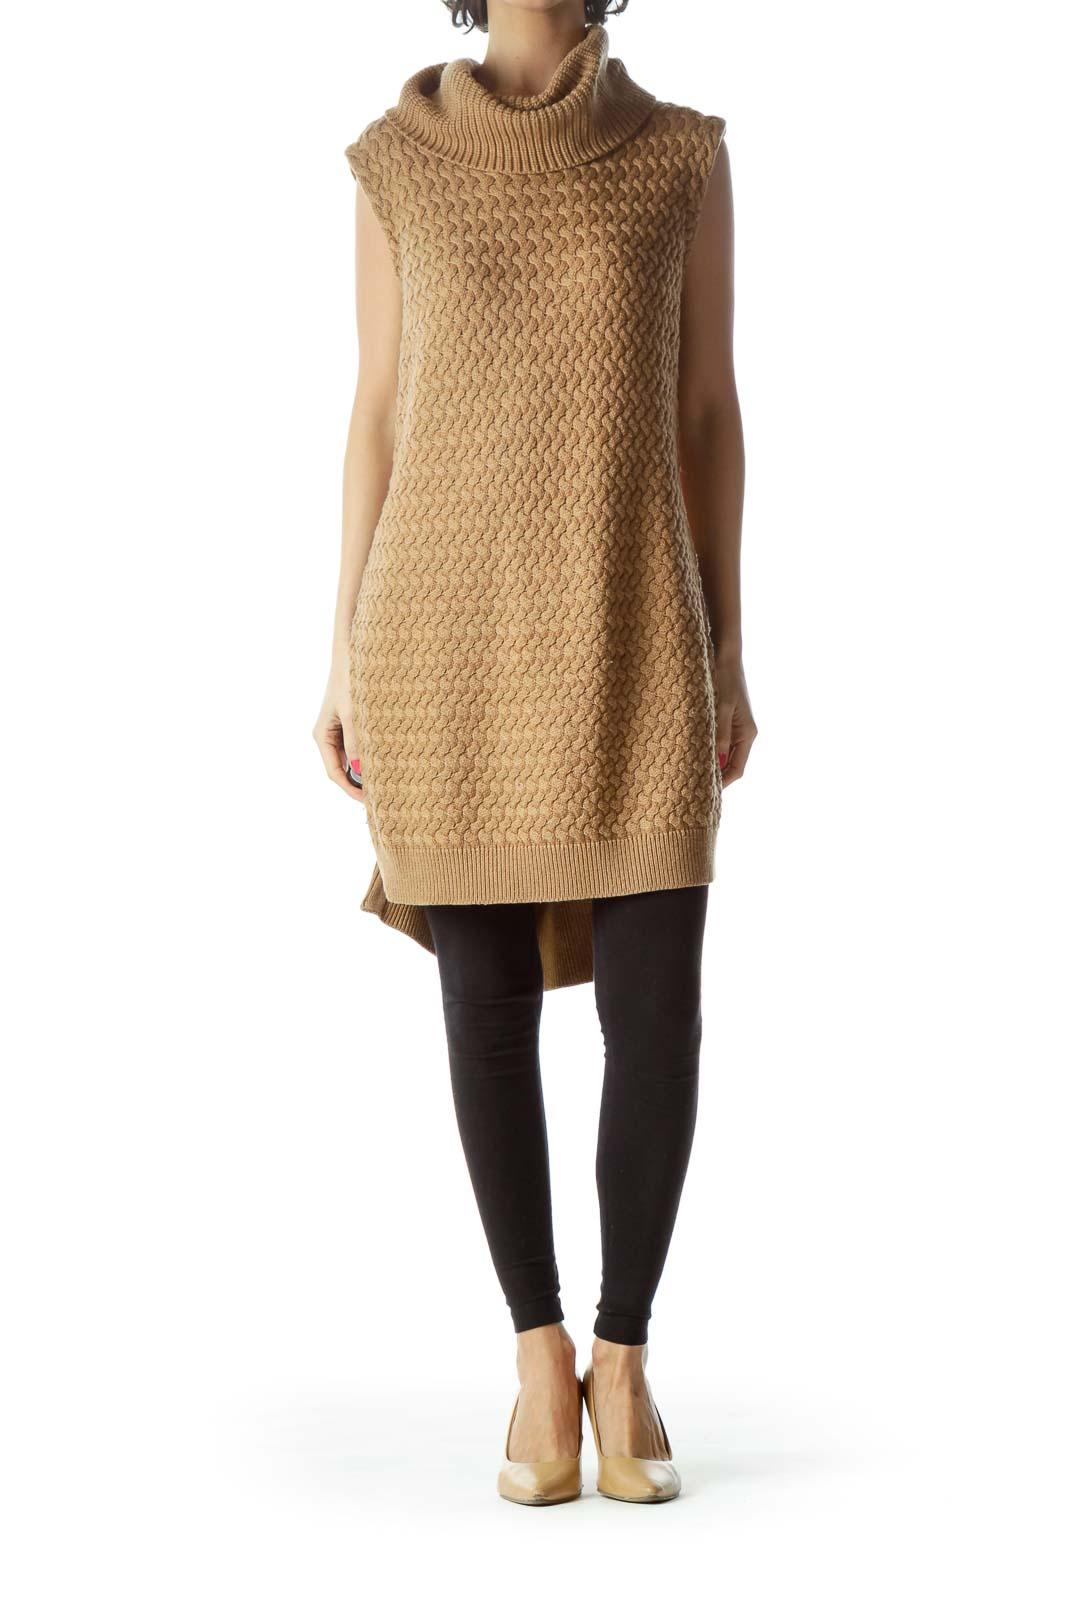 Brown Sleeveless Turtleneck Knit with Zipper Detail